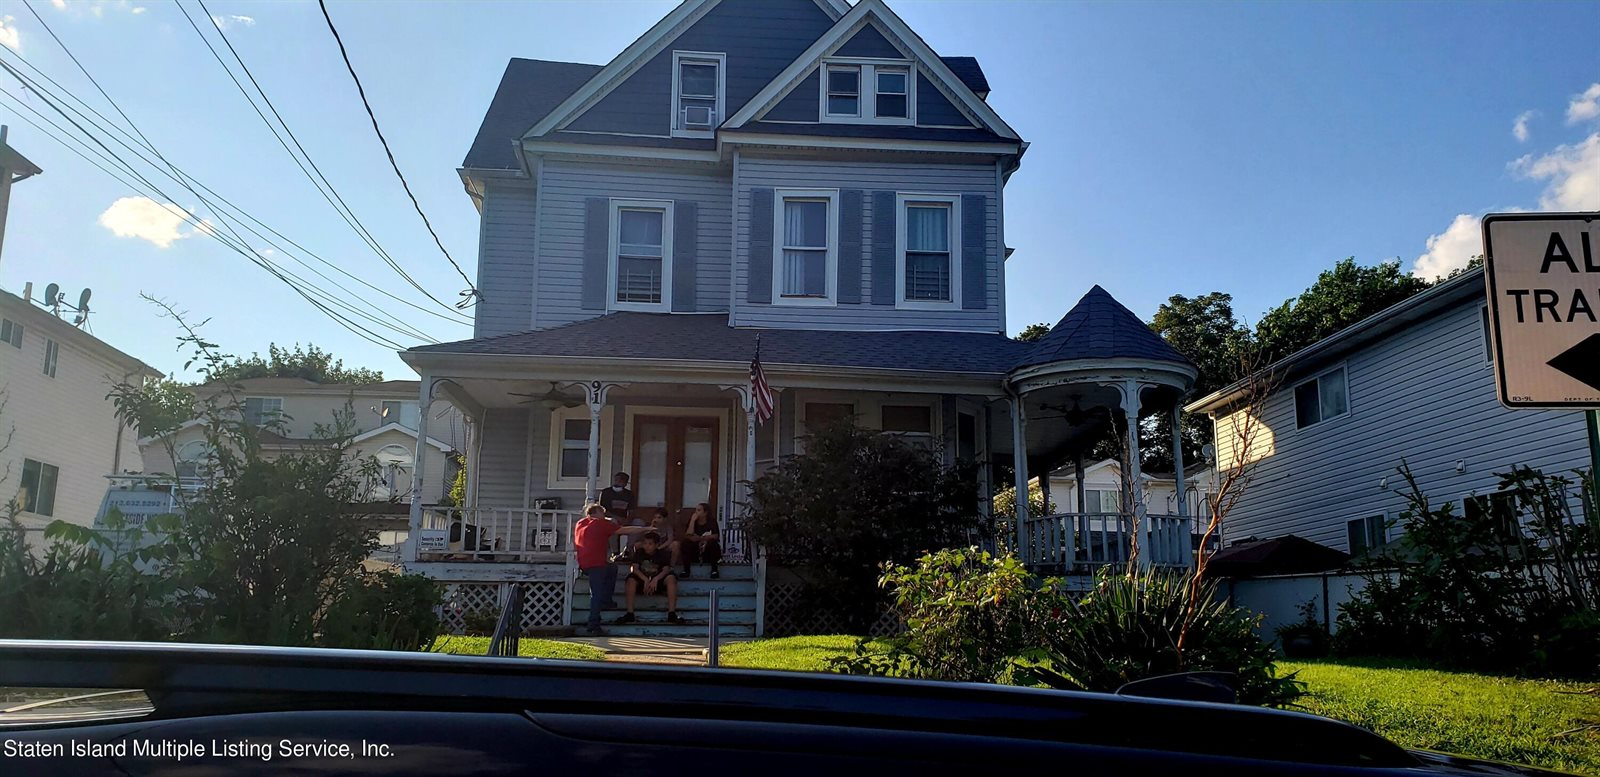 91 Greenfield Avenue, Staten Island, NY 10304